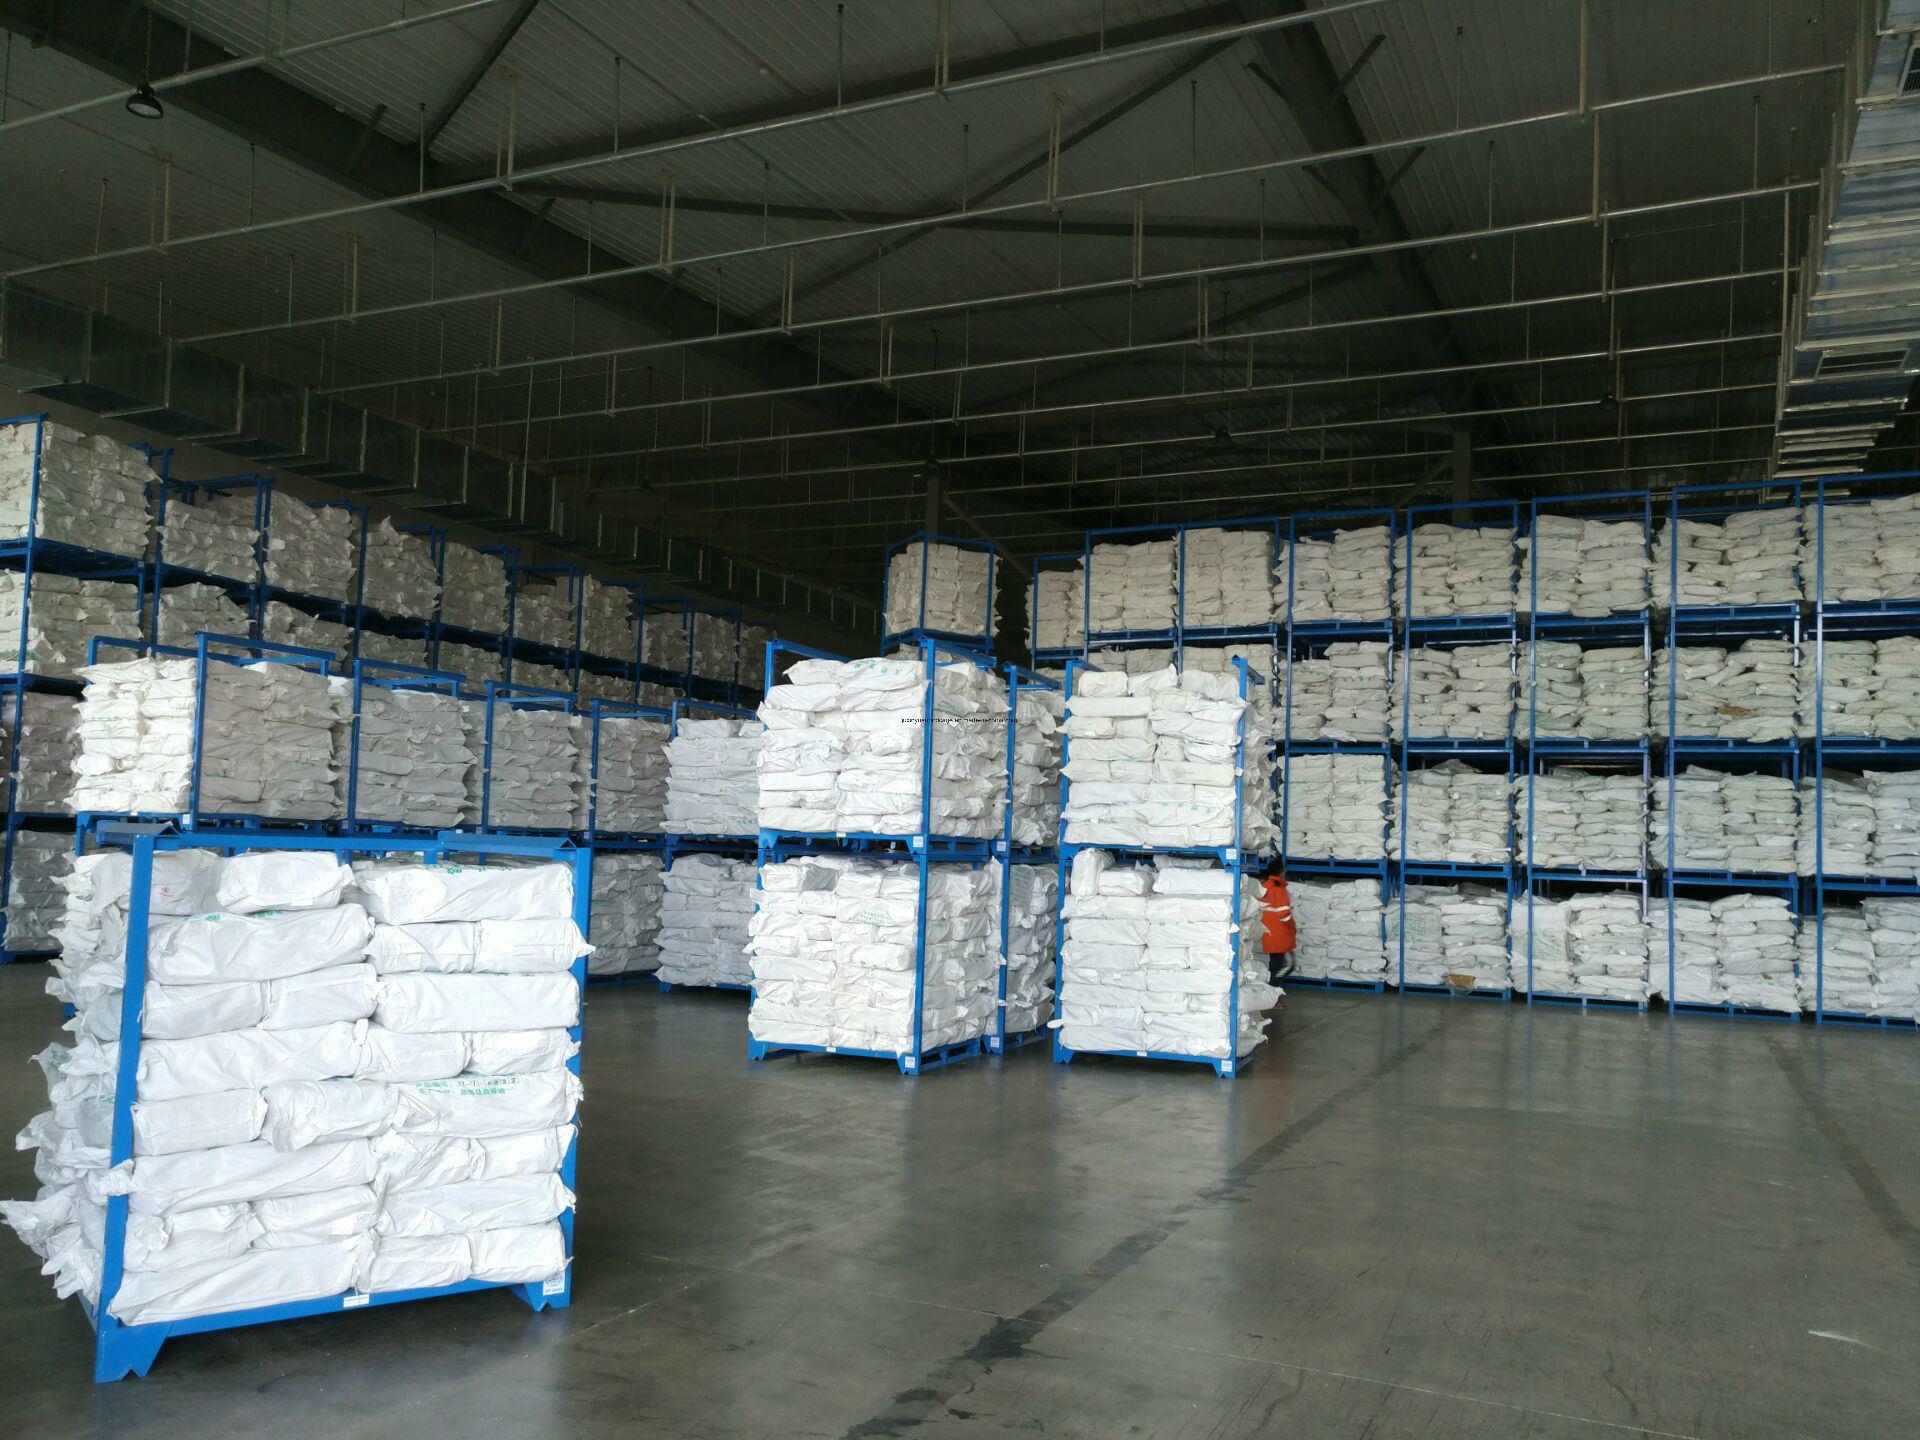 Direct Factory Supplier Warehouse Metal Stacking Racks